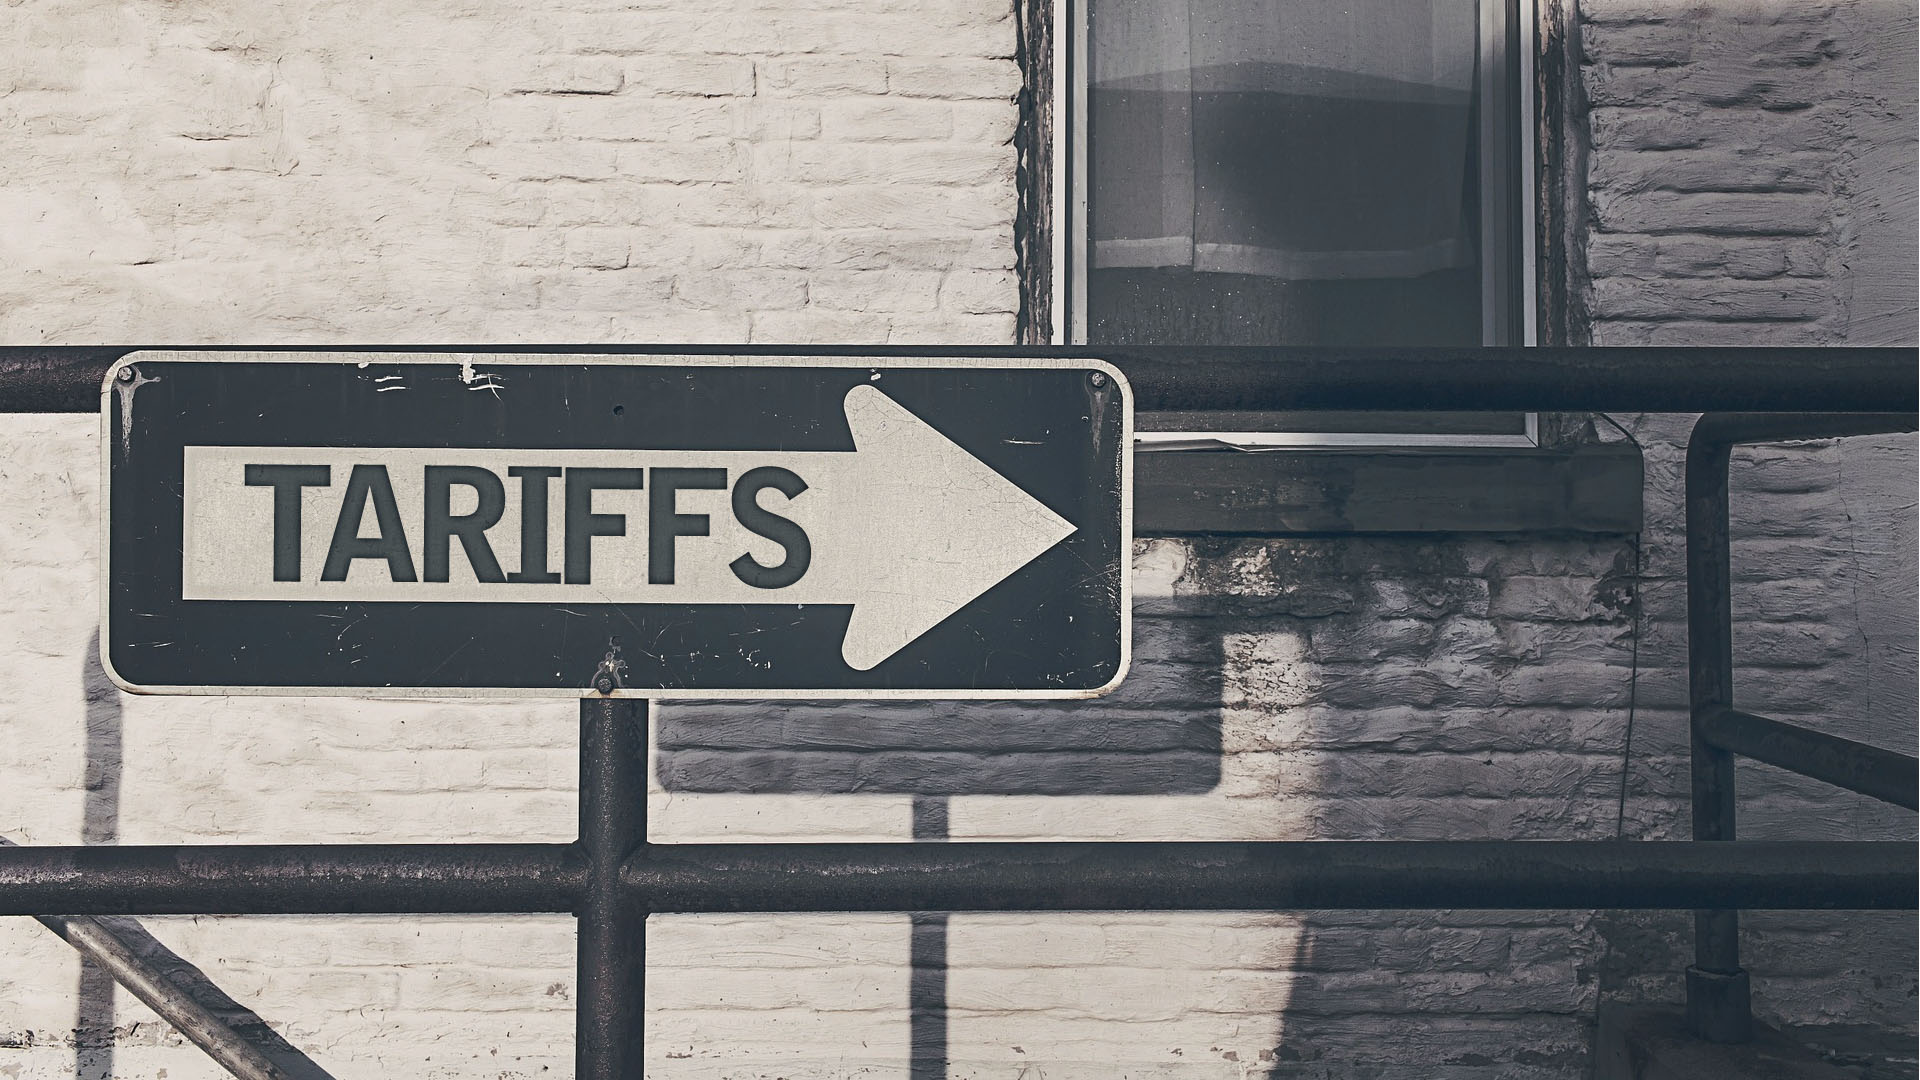 tariffs_2018.jpg